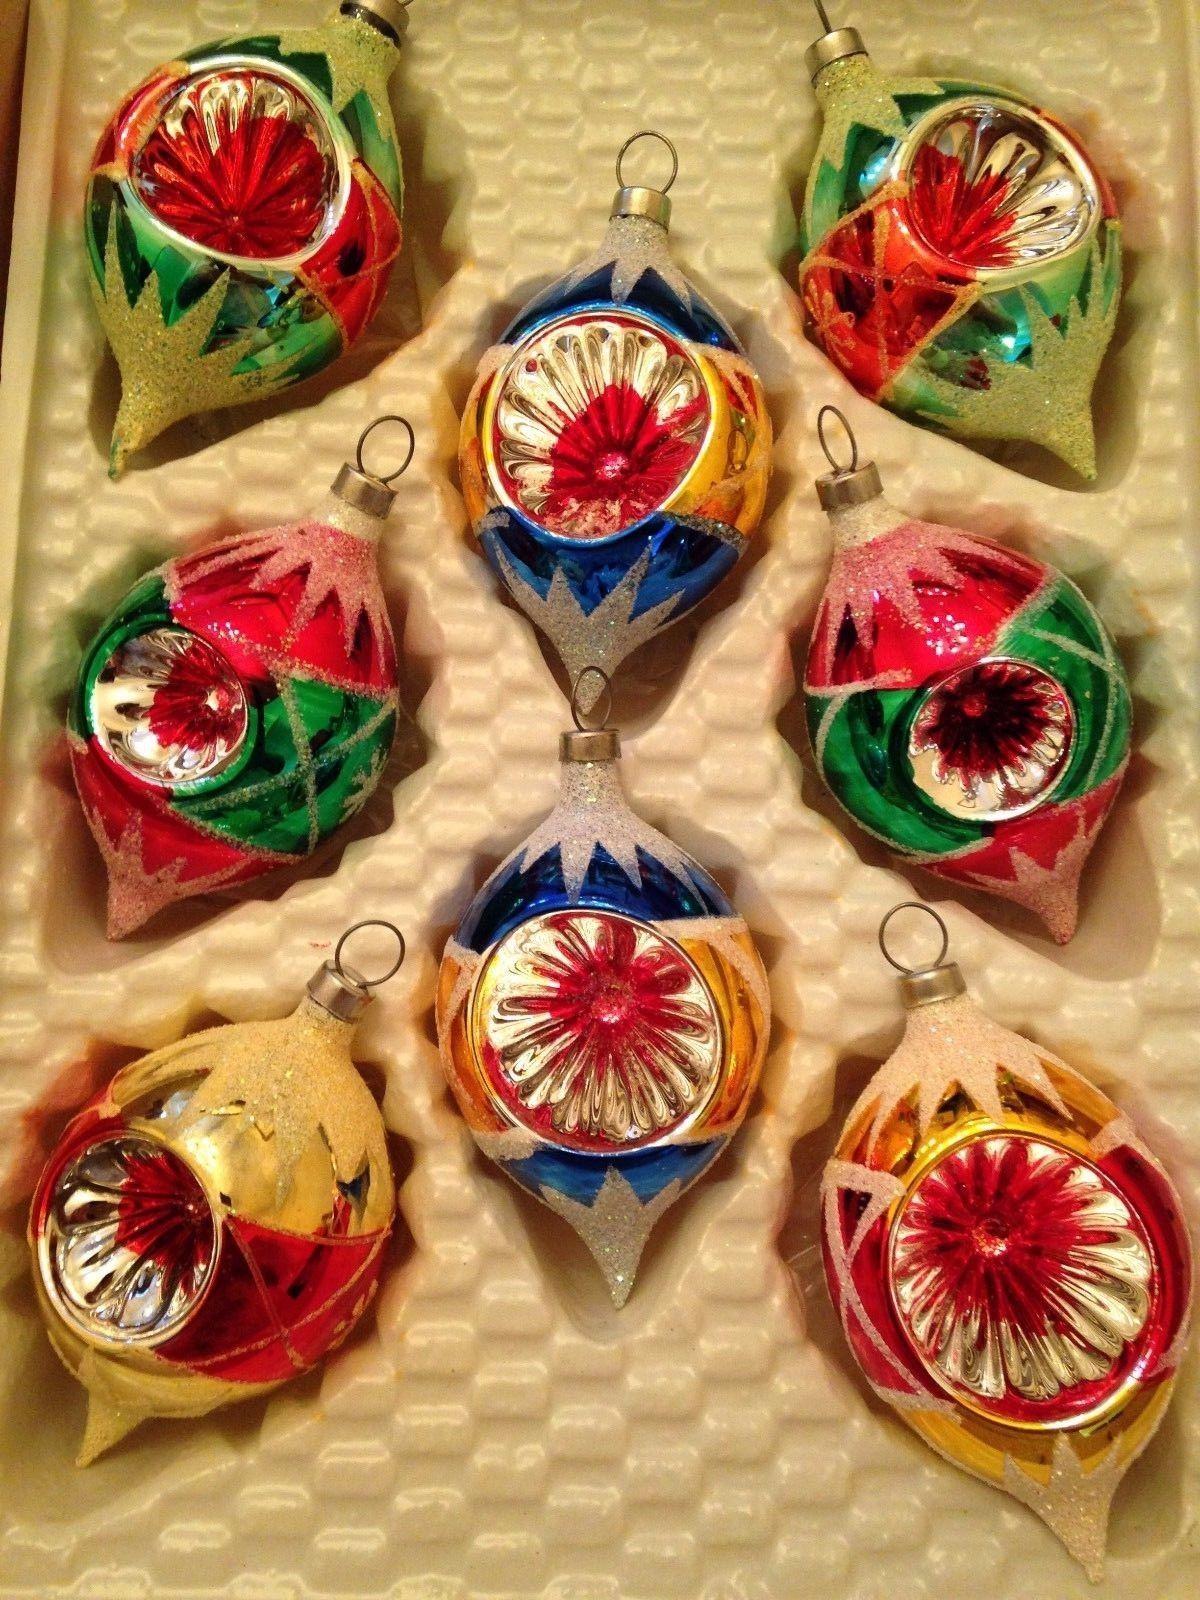 Vintage Christmas Ornament Sputnik Red Star Mid Century Eames Era